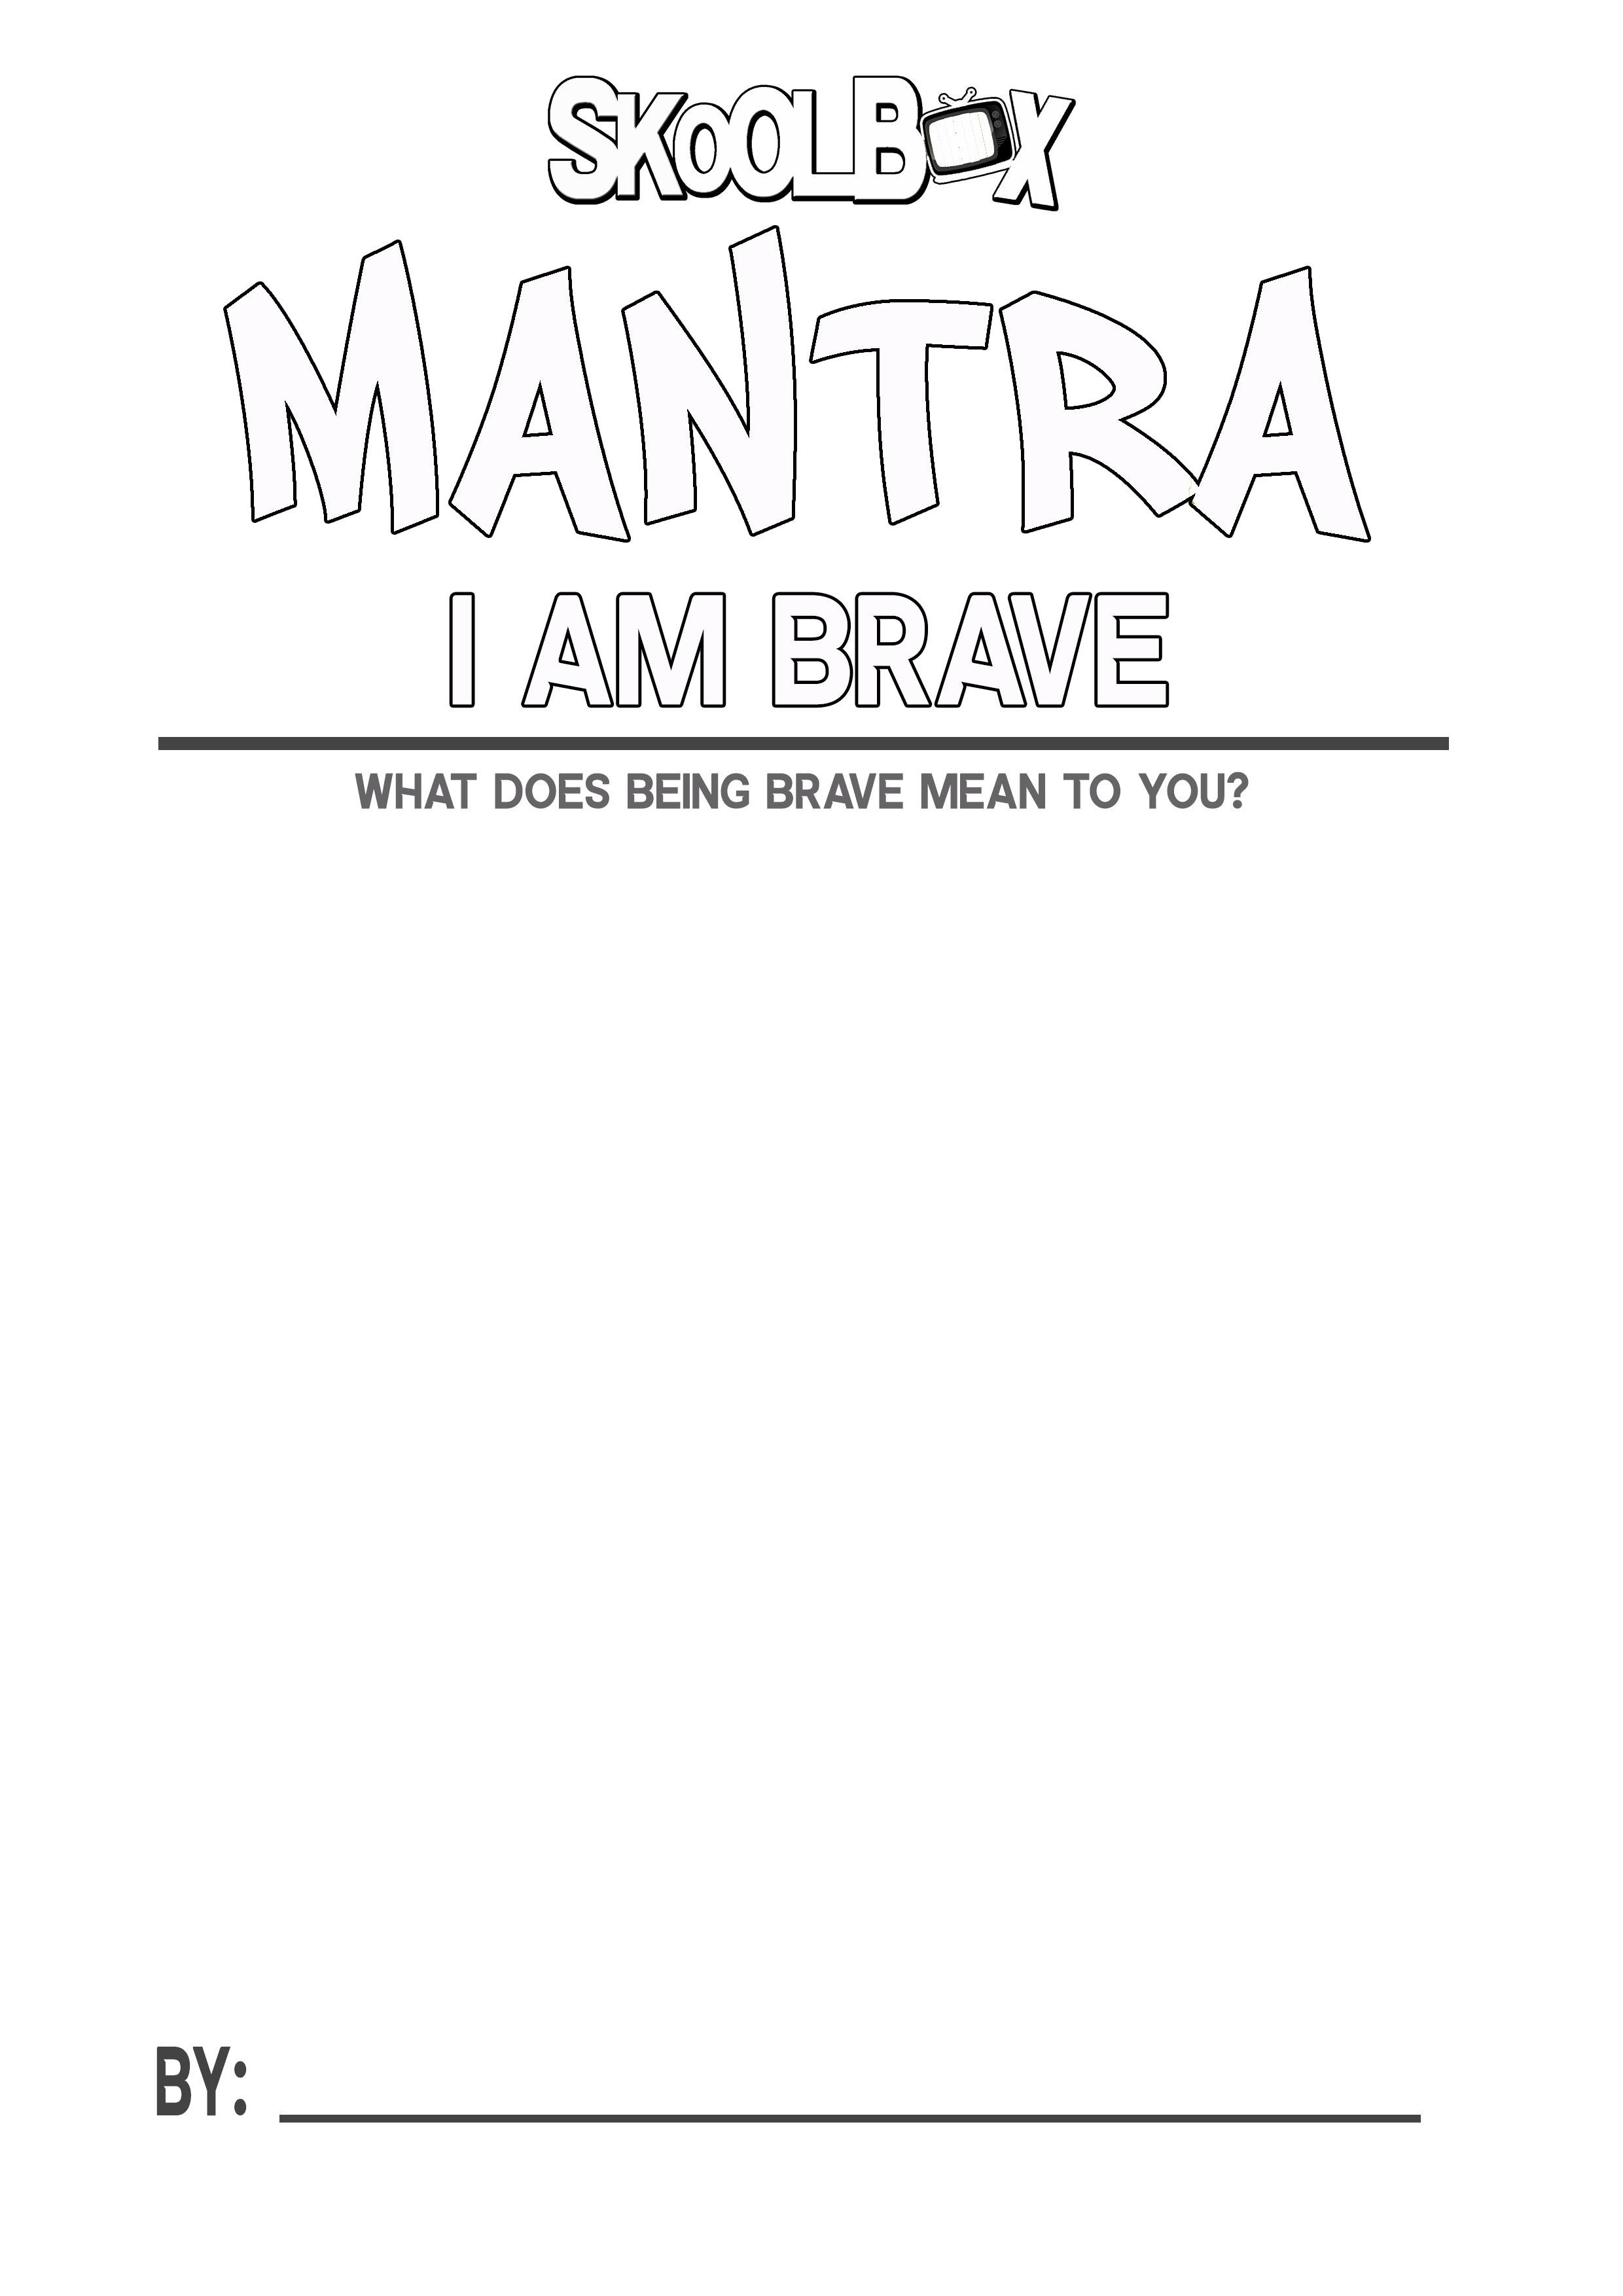 MANTRA 11 BRAVE